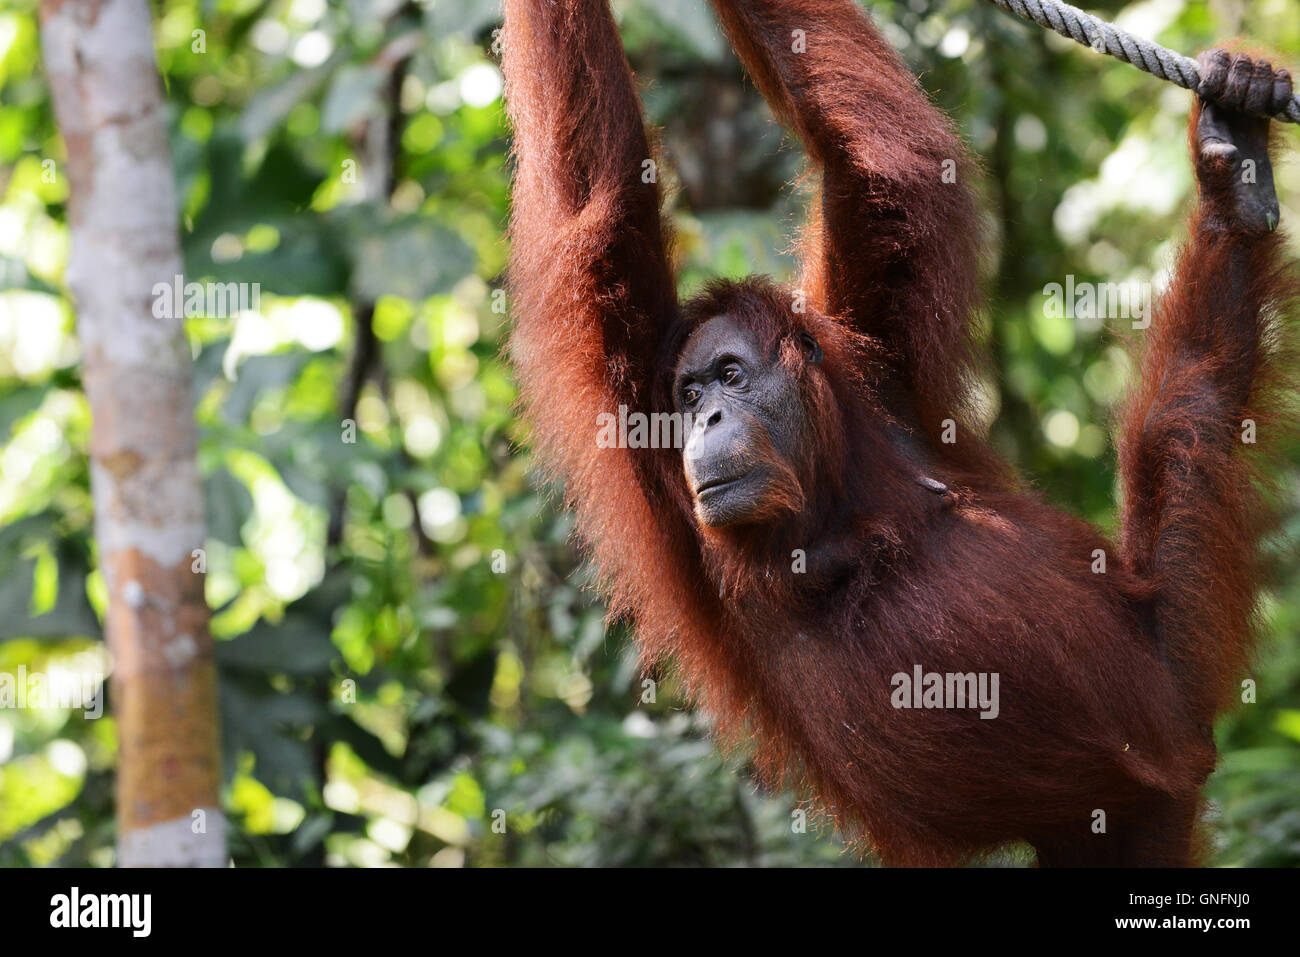 A female Orangutan waiting to be fed at the Semenggoh rehabilitation center near Kuching, Sarawak. - Stock Image